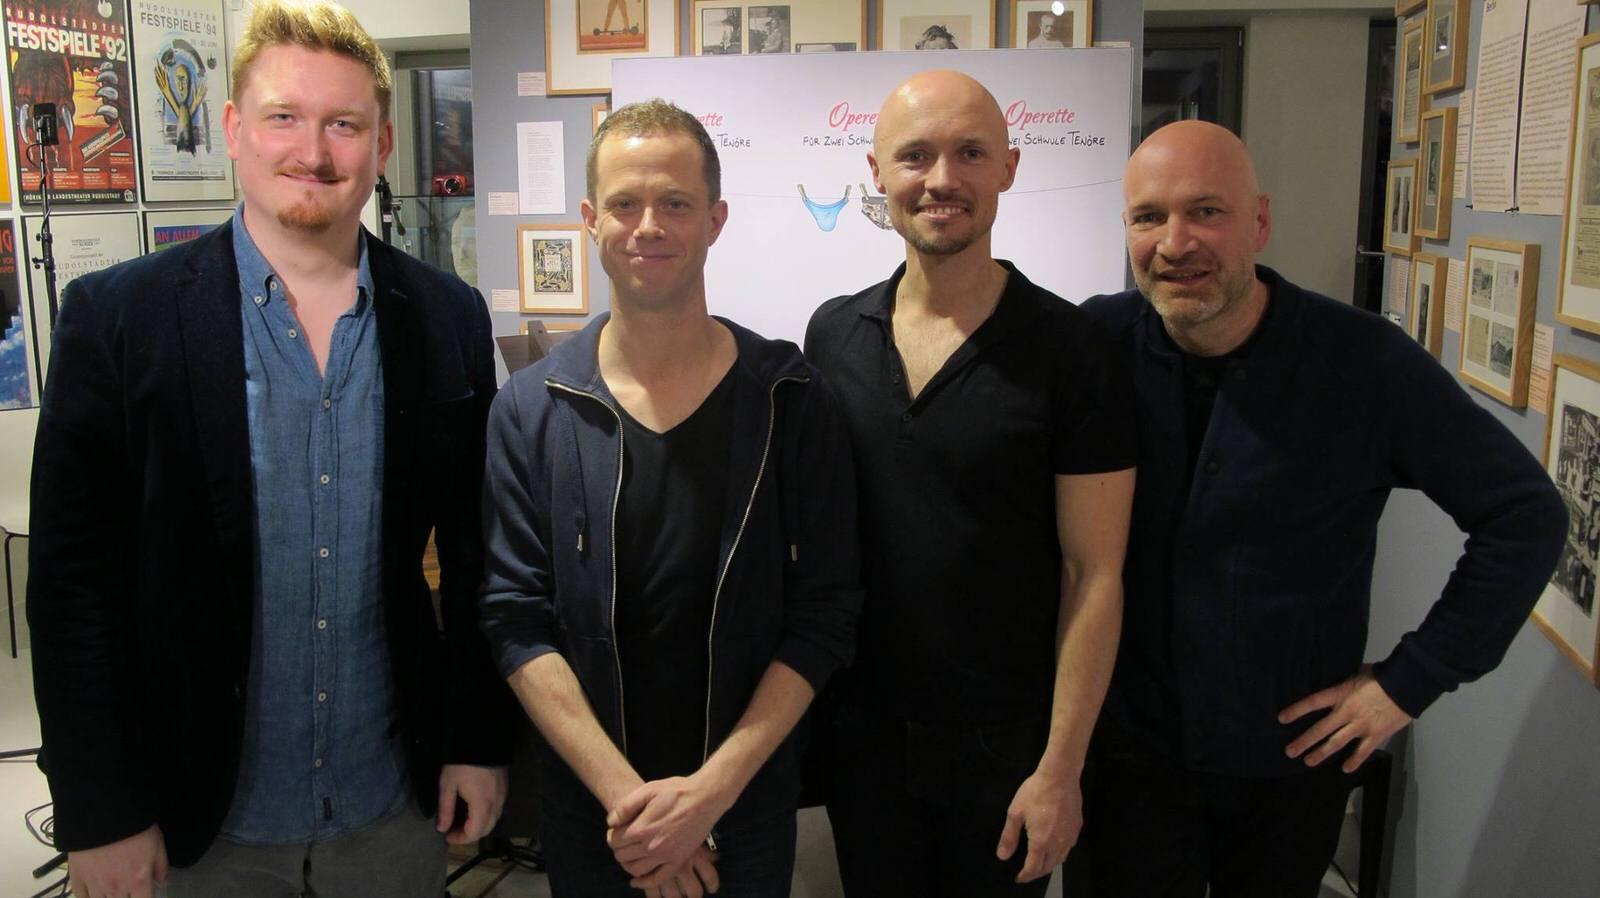 v.l.: Danile Philipp Witte, FLorain Ludewig, Eric Rentmeister, Johannes Kram